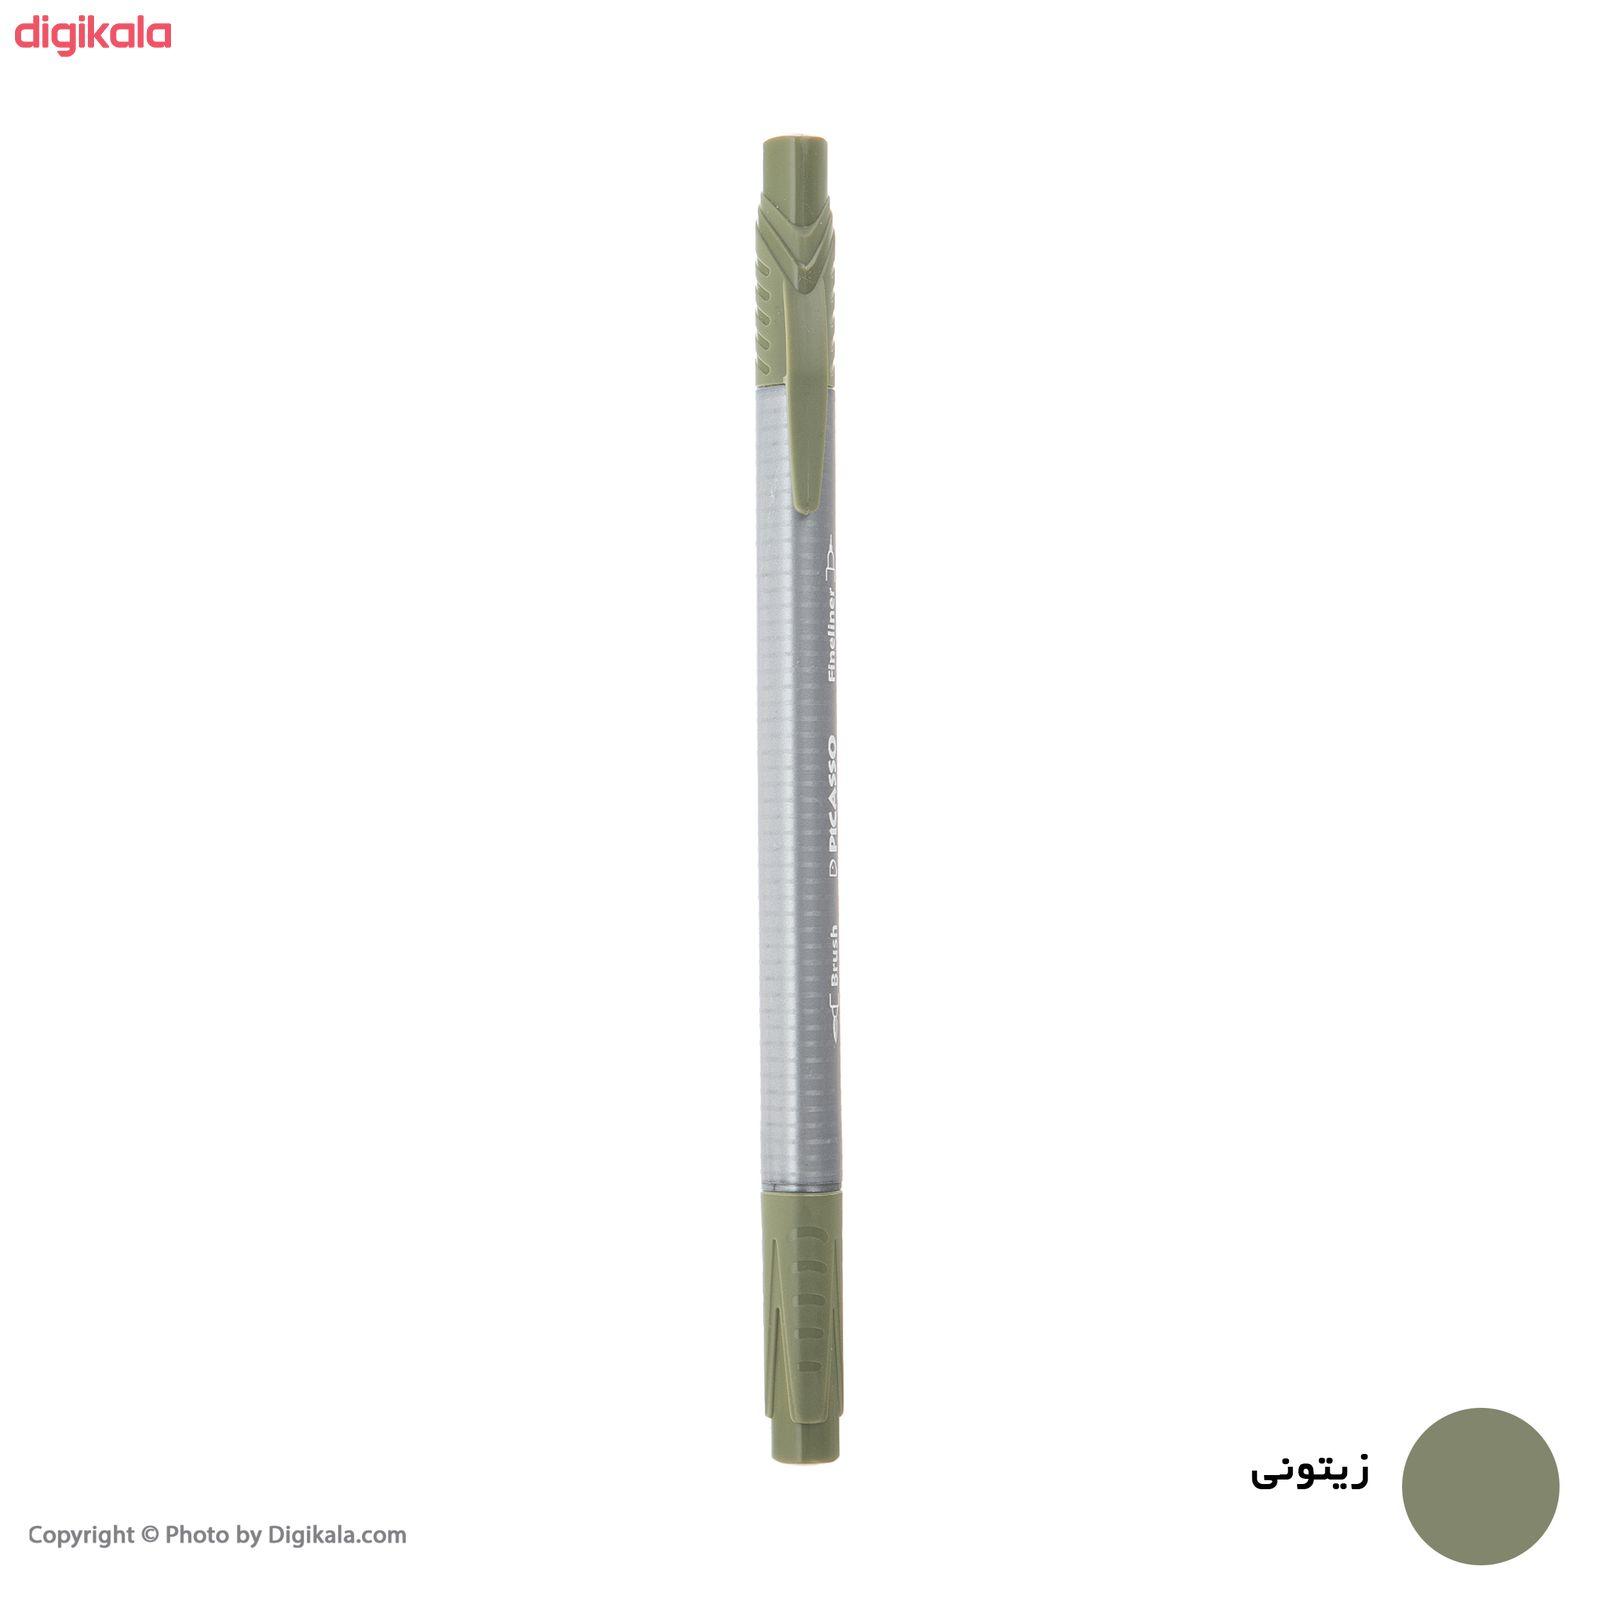 روان نویس پیکاسو مدل Brush Marker Fine Liner main 1 12